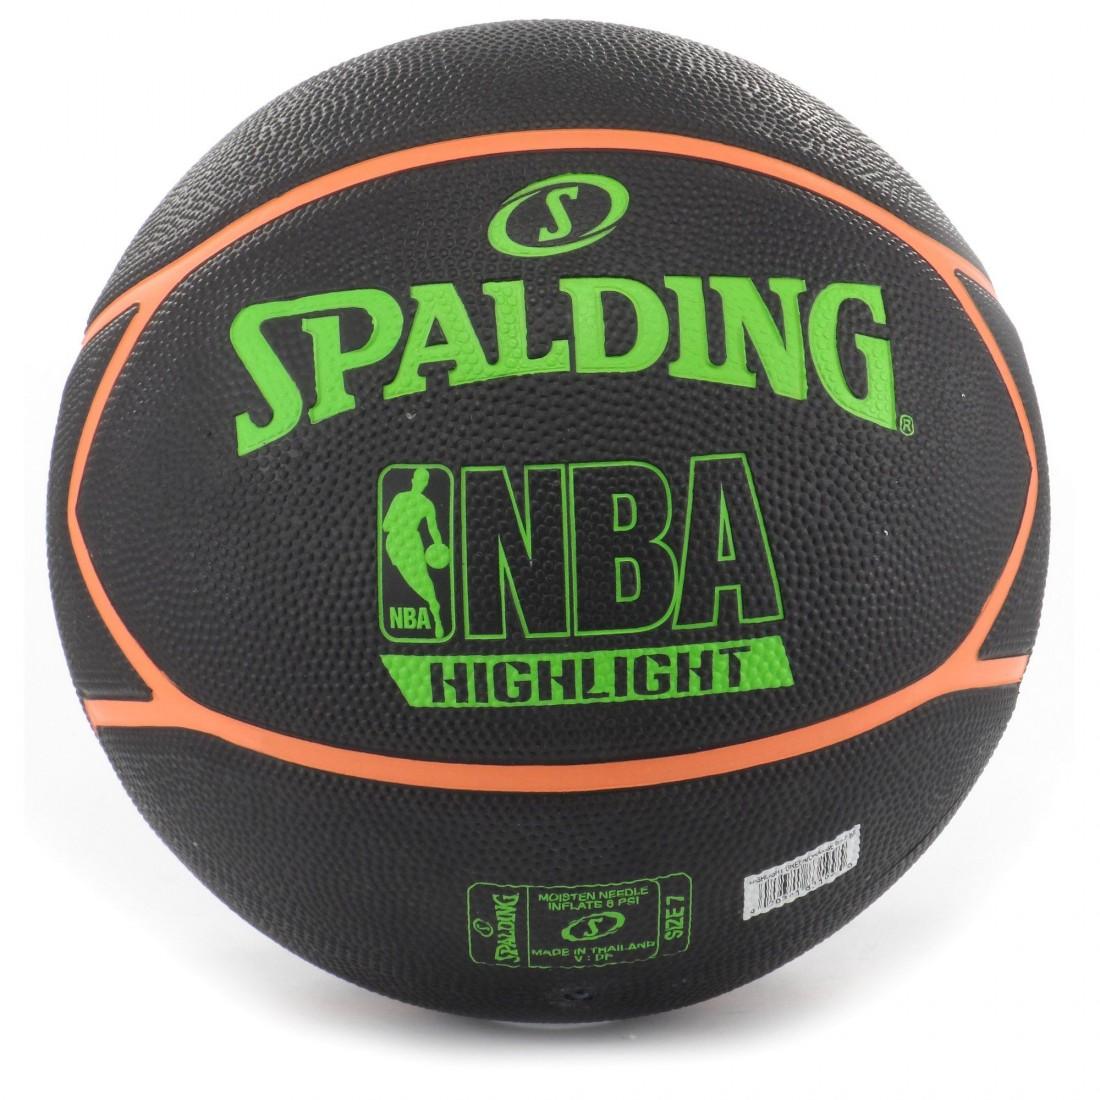 eeaa6ce89ef SPALDING Neon Highlite гумена баскетболна топка Спалдинг за зала ...